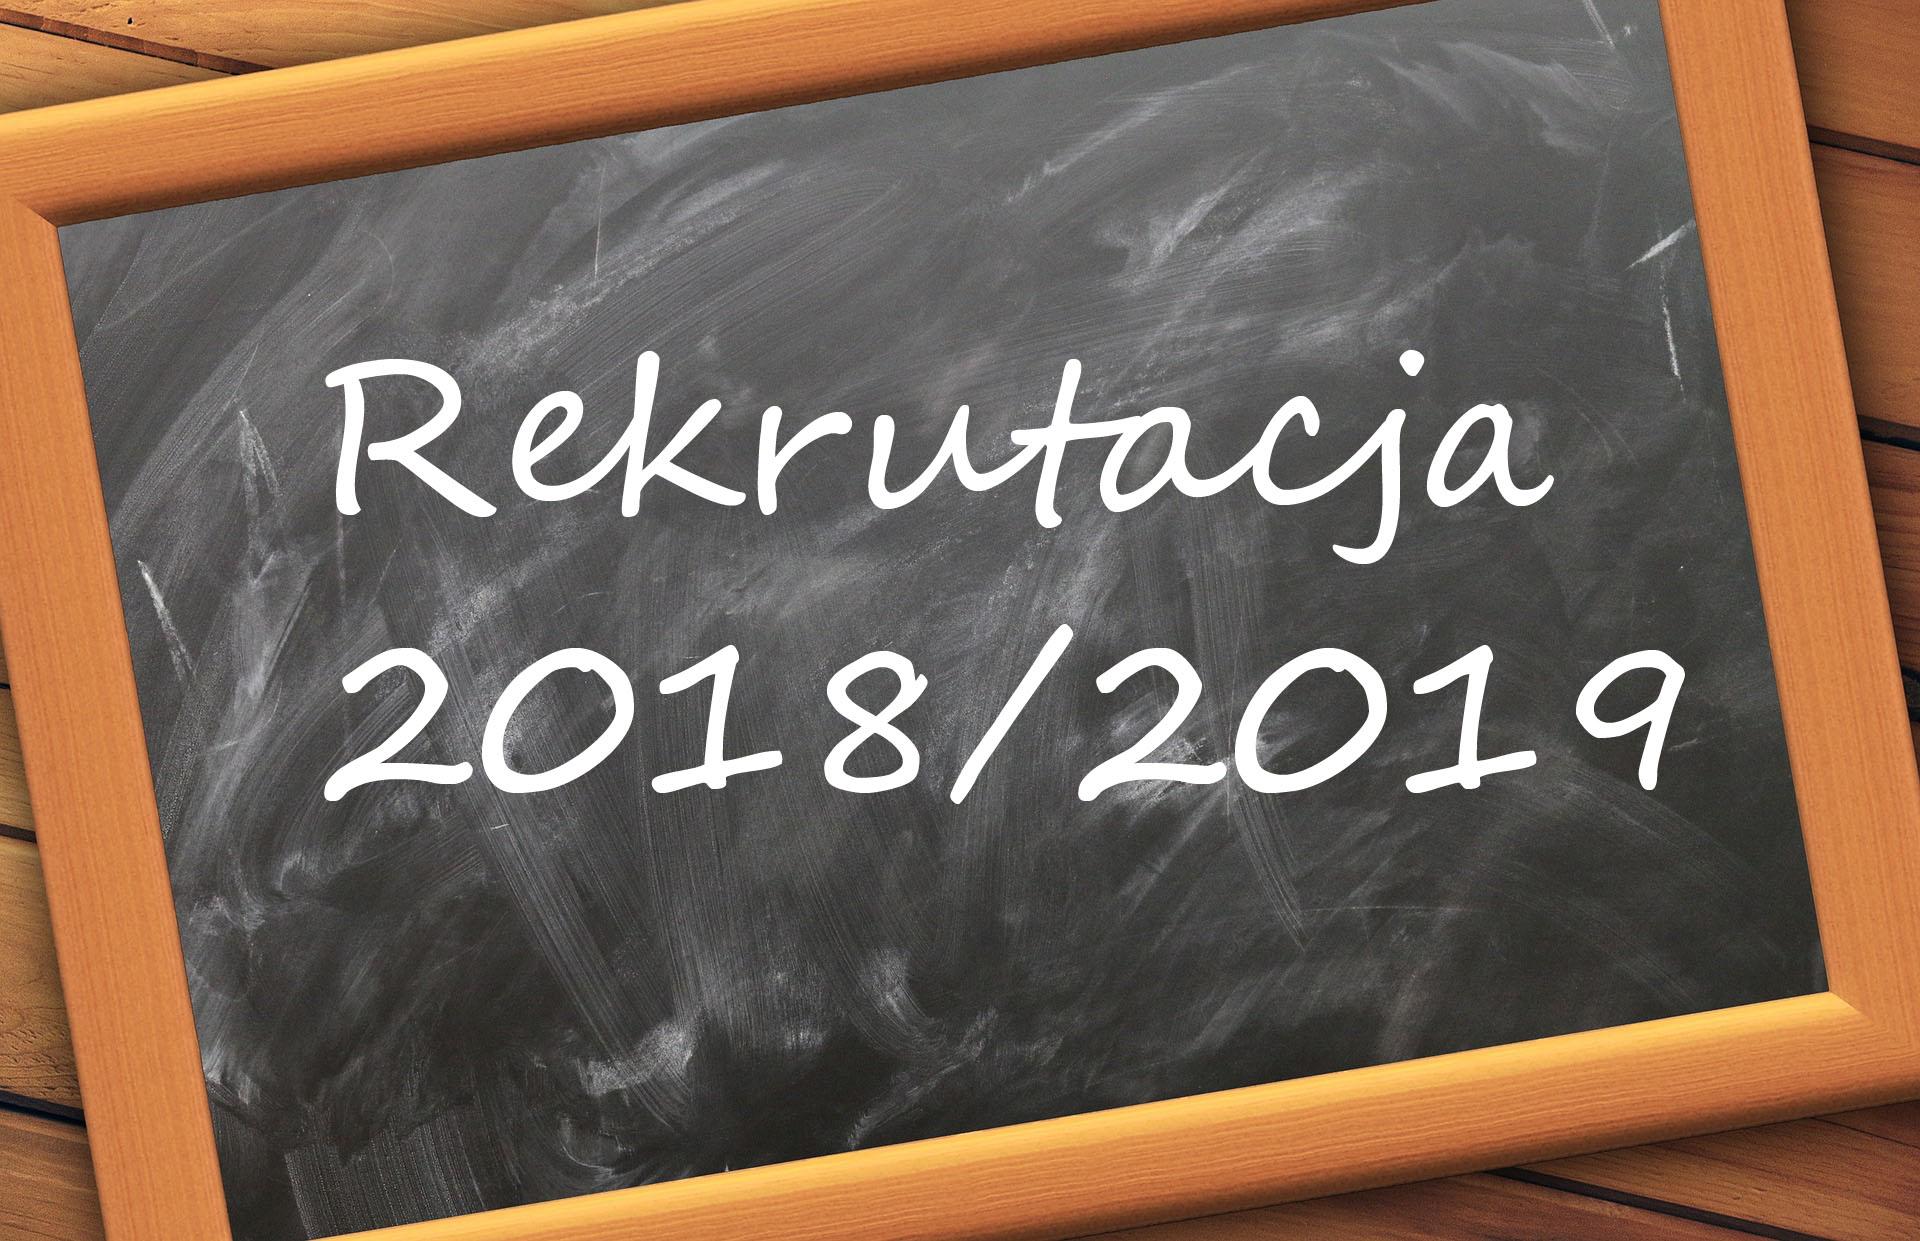 Rekrutacja na rok szkolny 2017/2018.